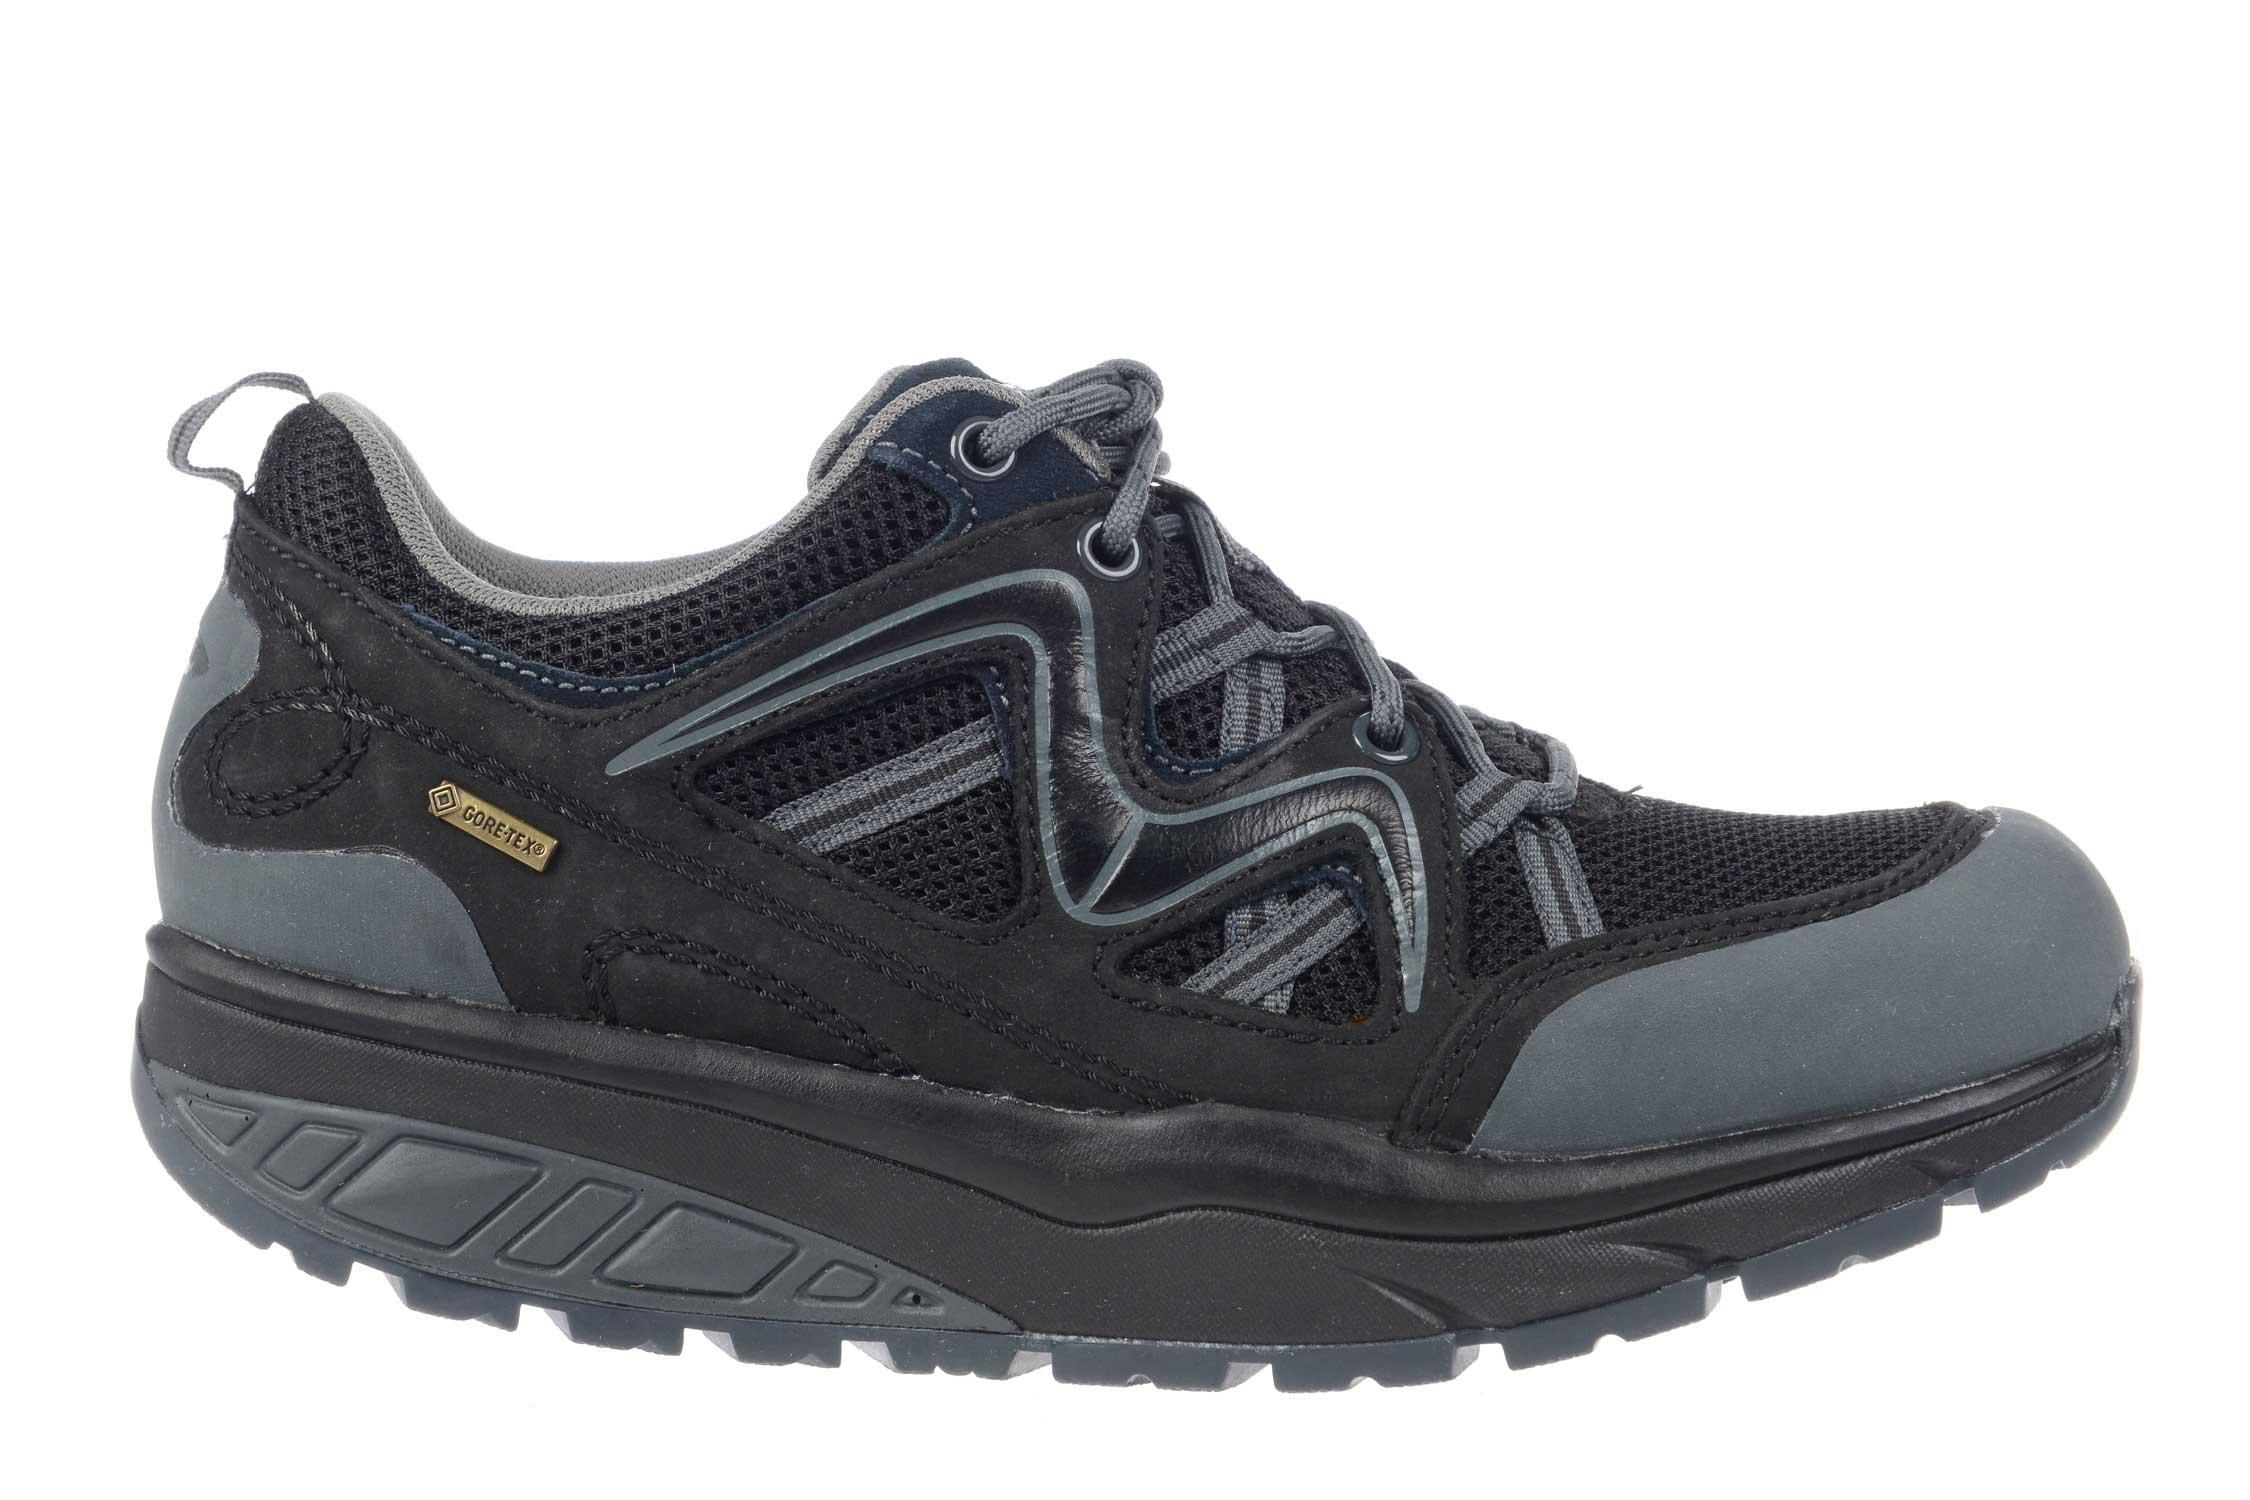 Mens Rocker Bottom Athletic Shoes